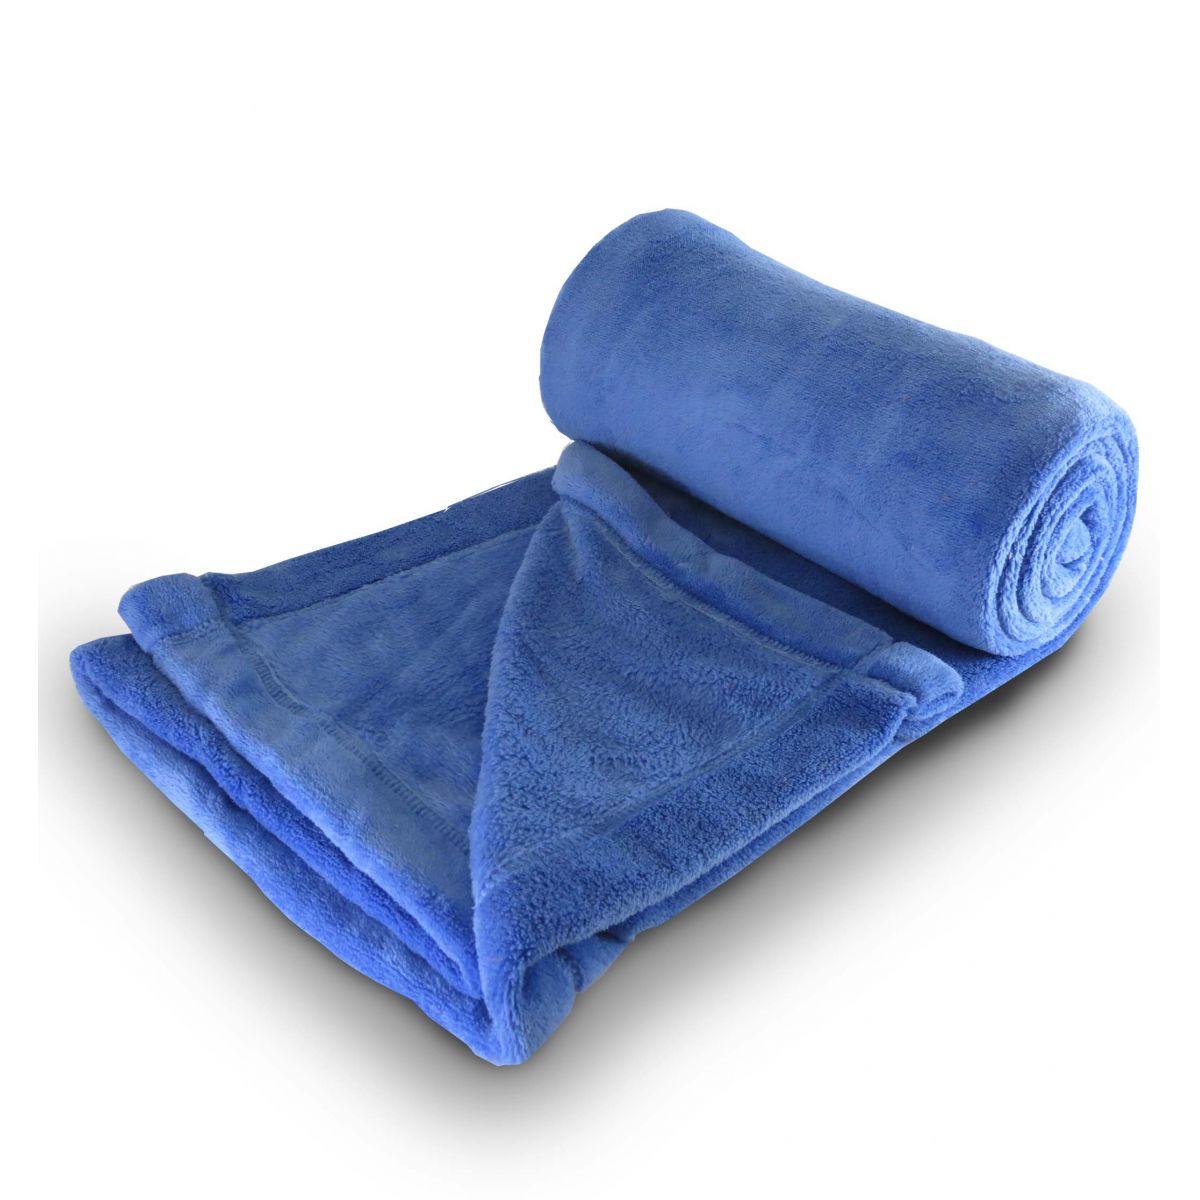 Cobertor de Microfibra King - Azul